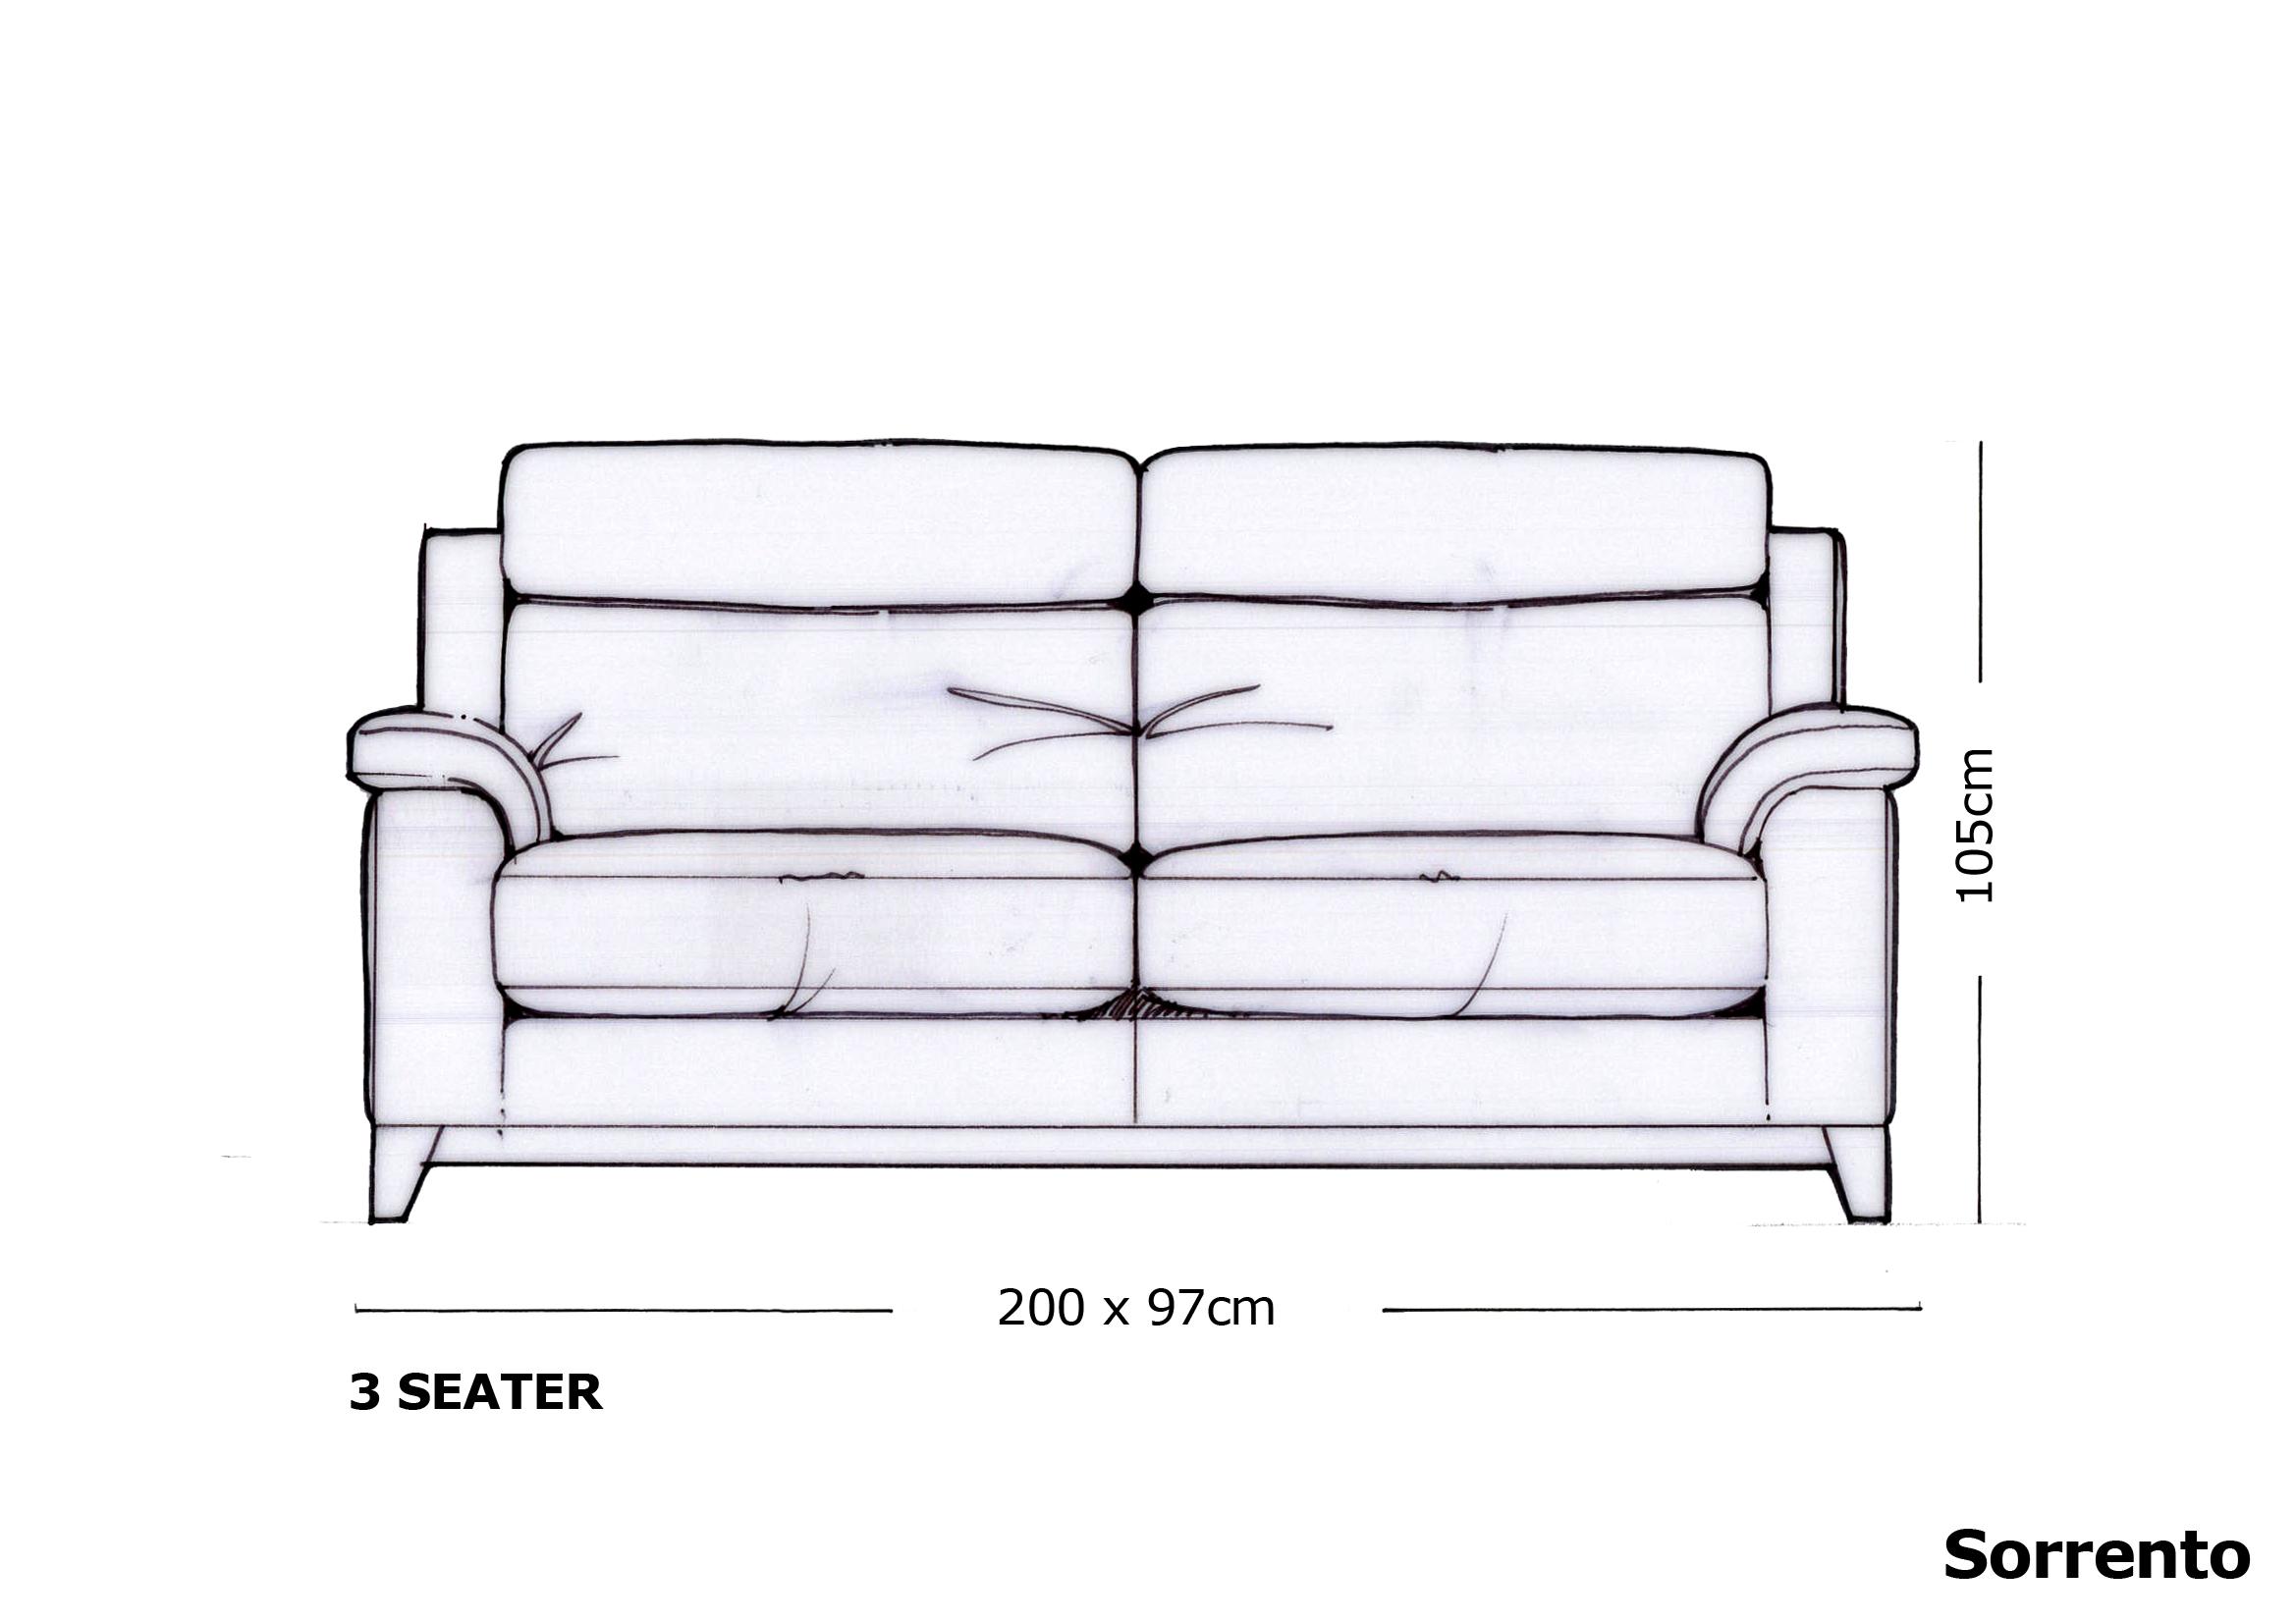 Sorrento 3 Seater Dimensions.jpg